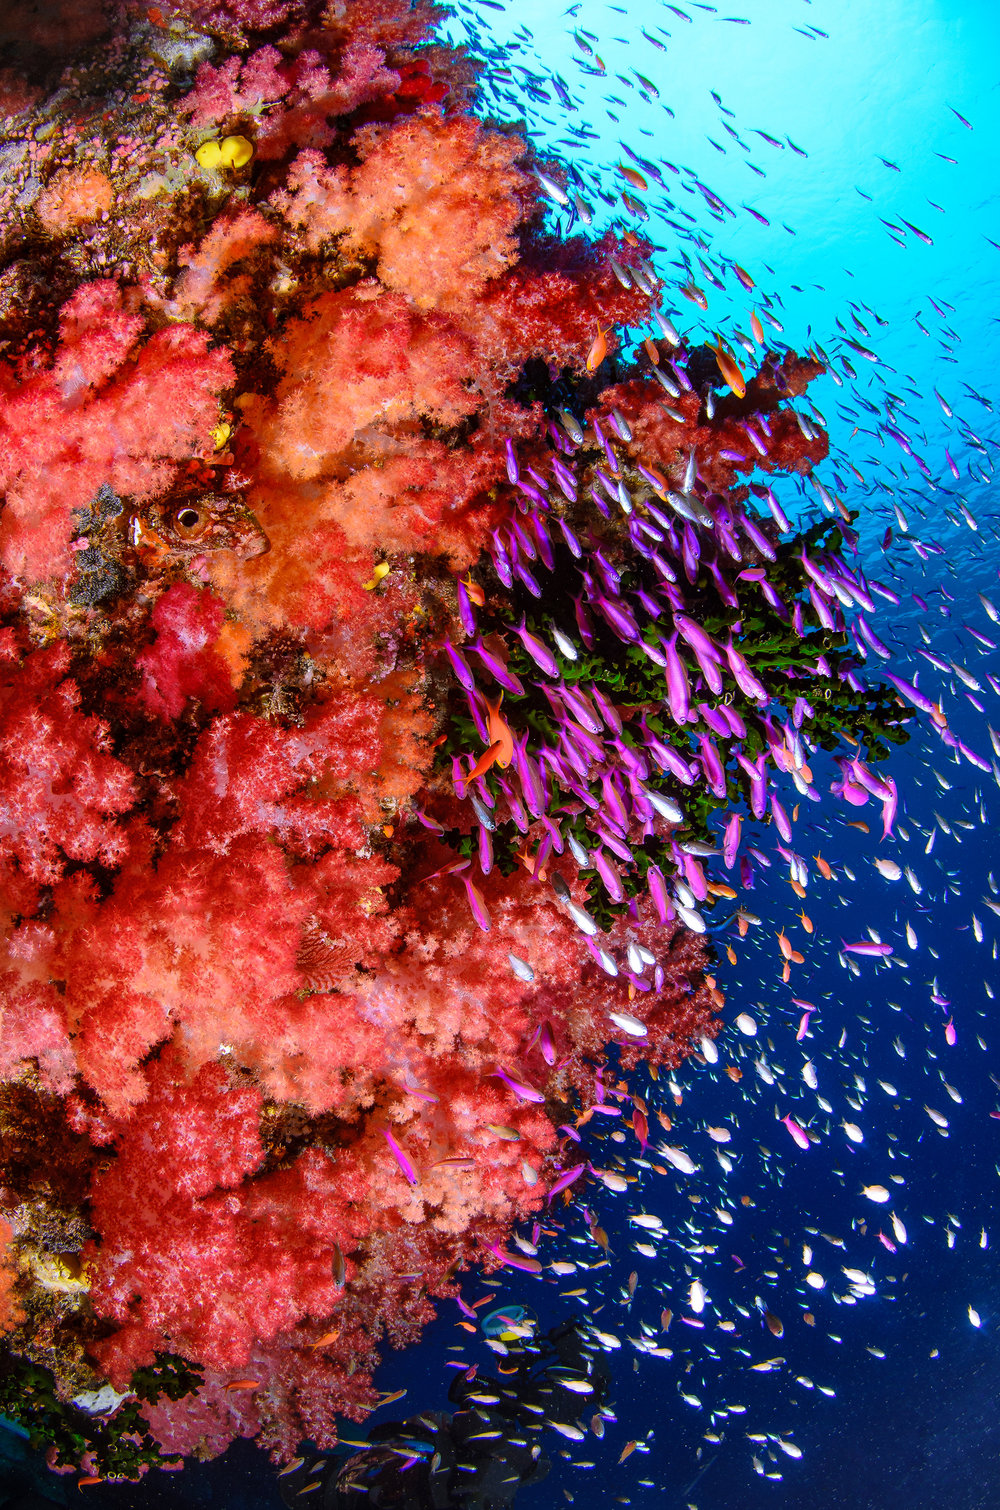 Taveuni, Fiji CREDIT: YEN-YI LEE